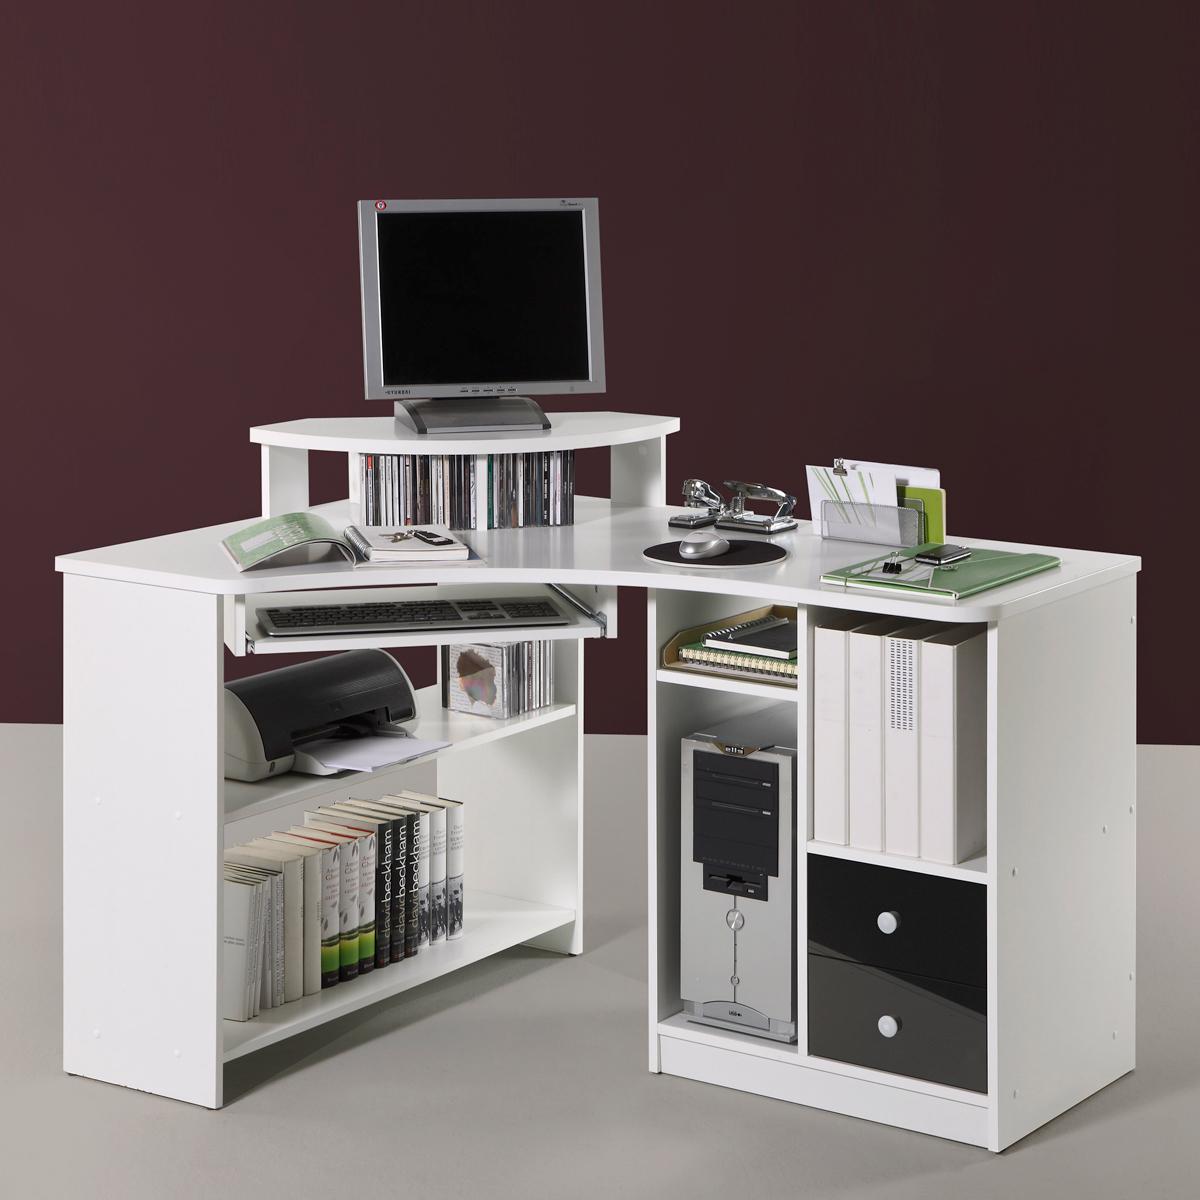 Pc eckschreibtisch  Eckschreibtisch Tanga Computer PC Schreibtisch Büro Jugendzimmer ...